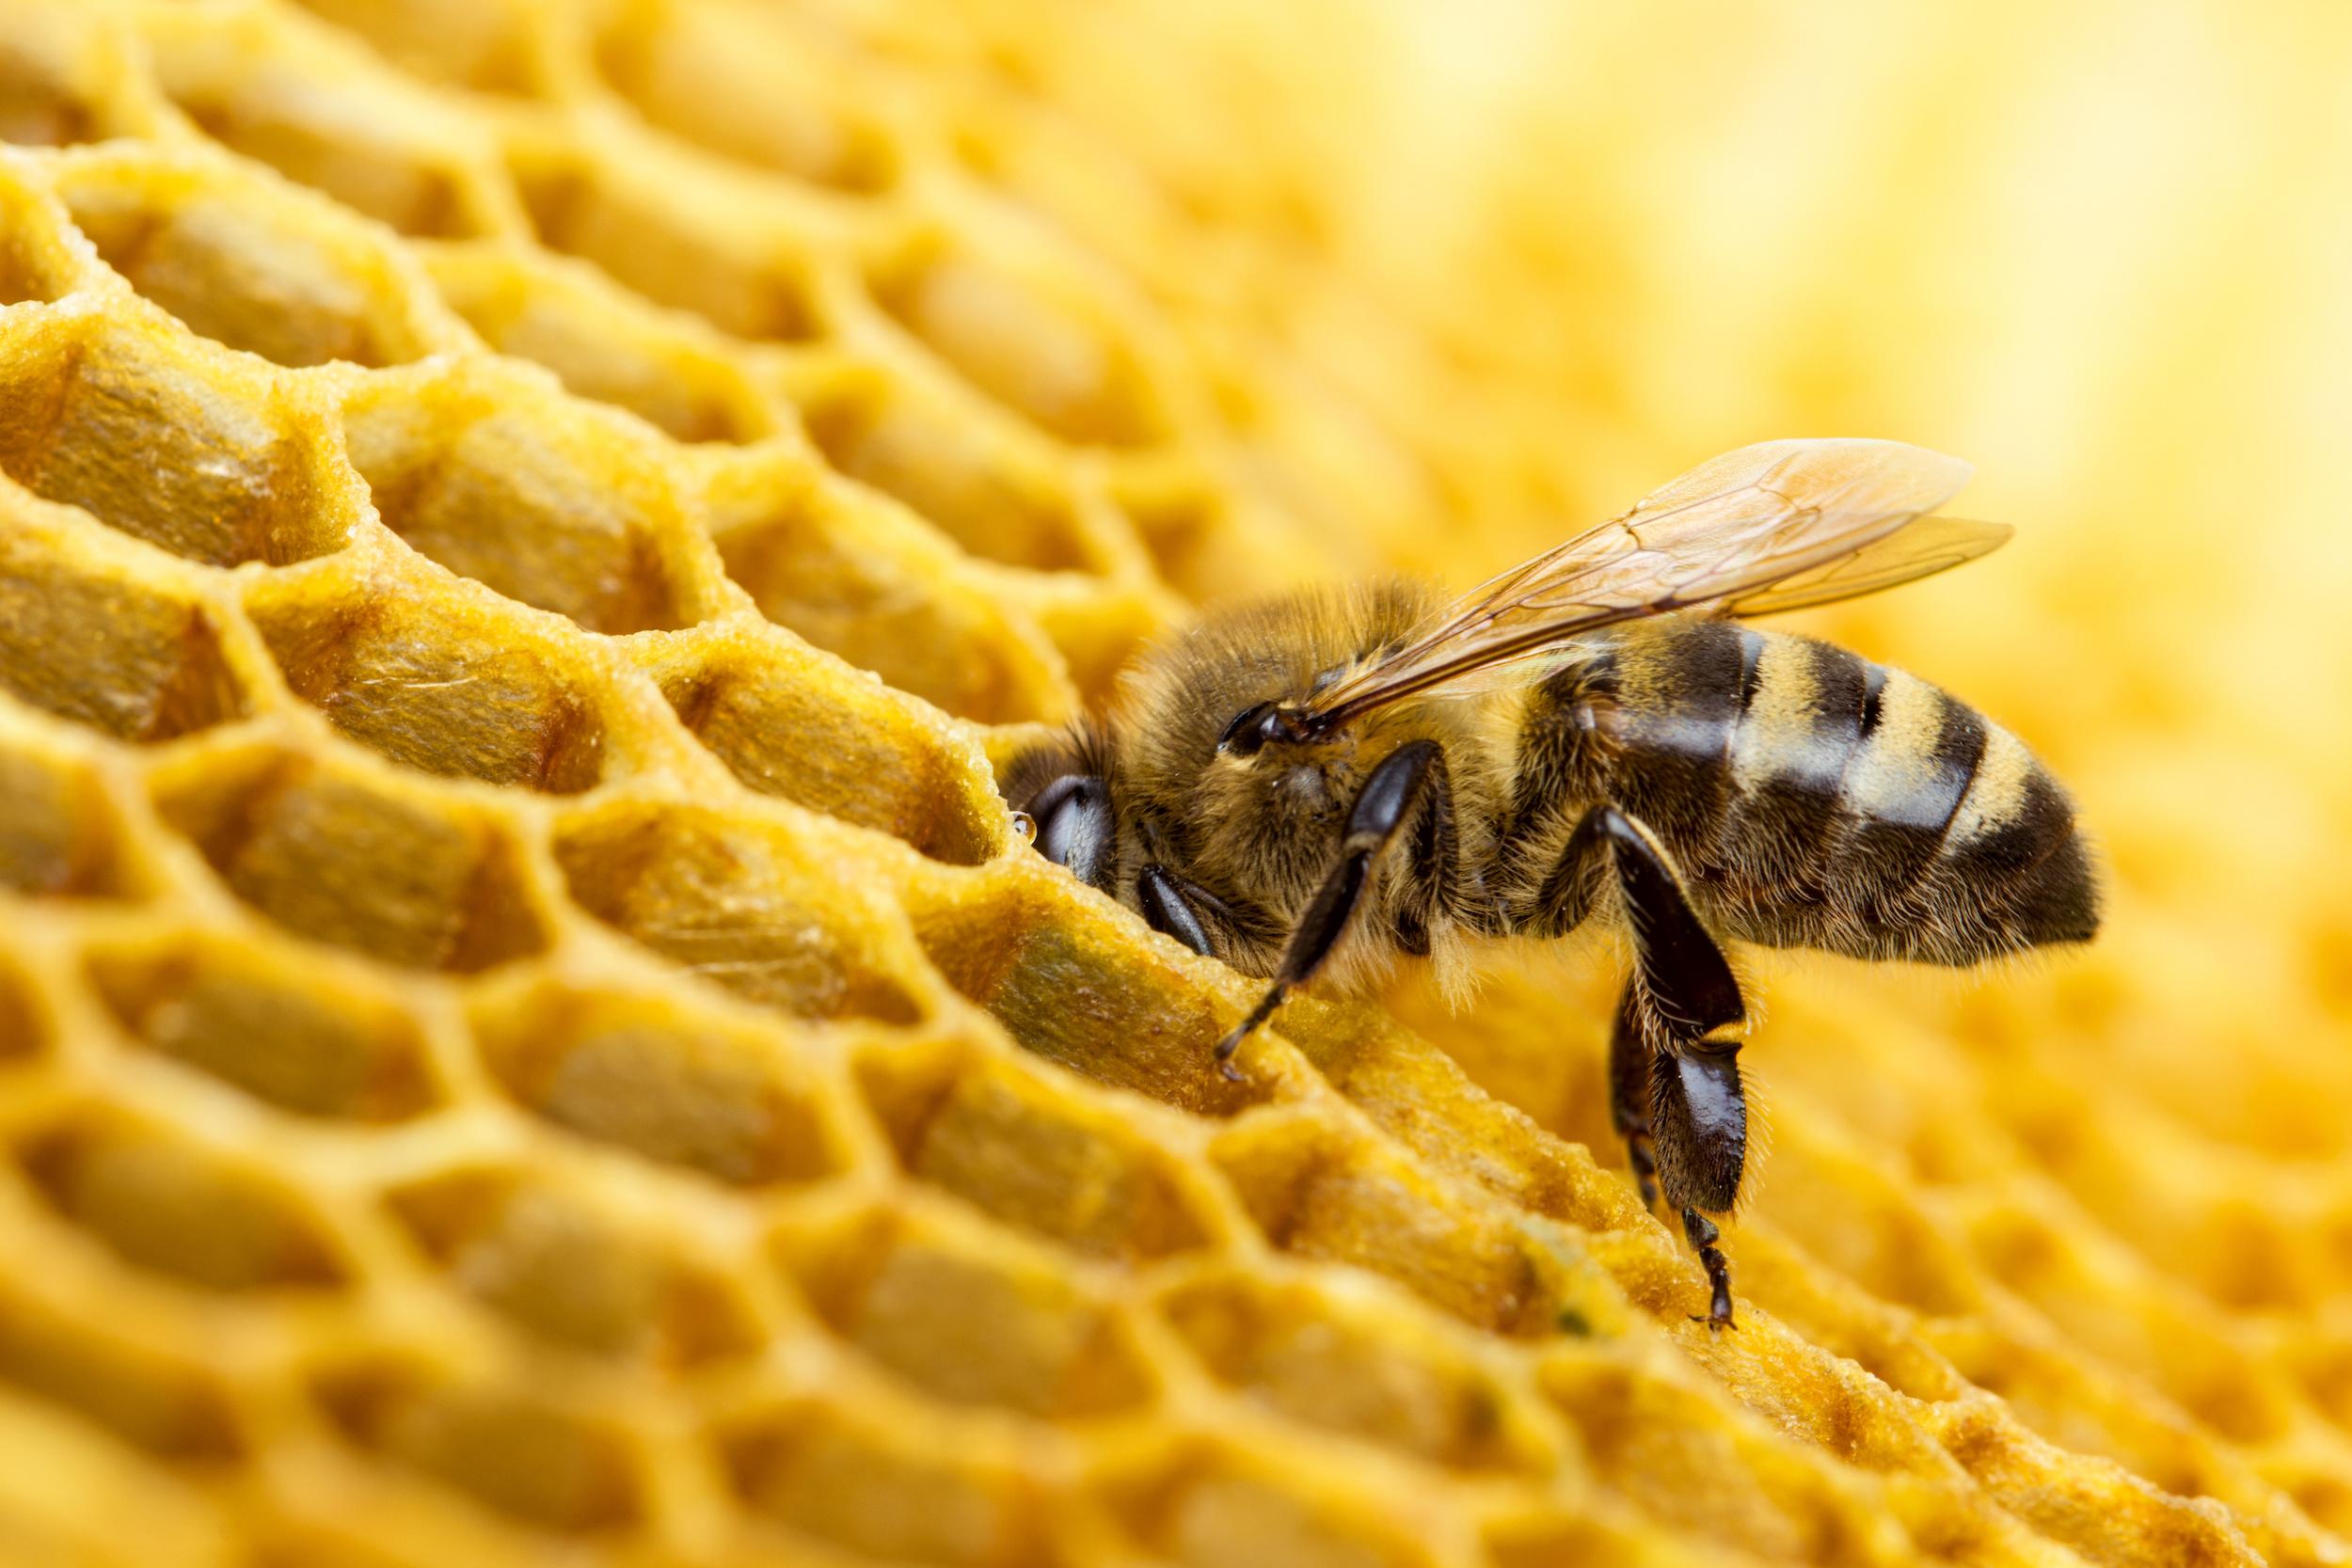 bees 2 AdobeStock_104008368.jpeg